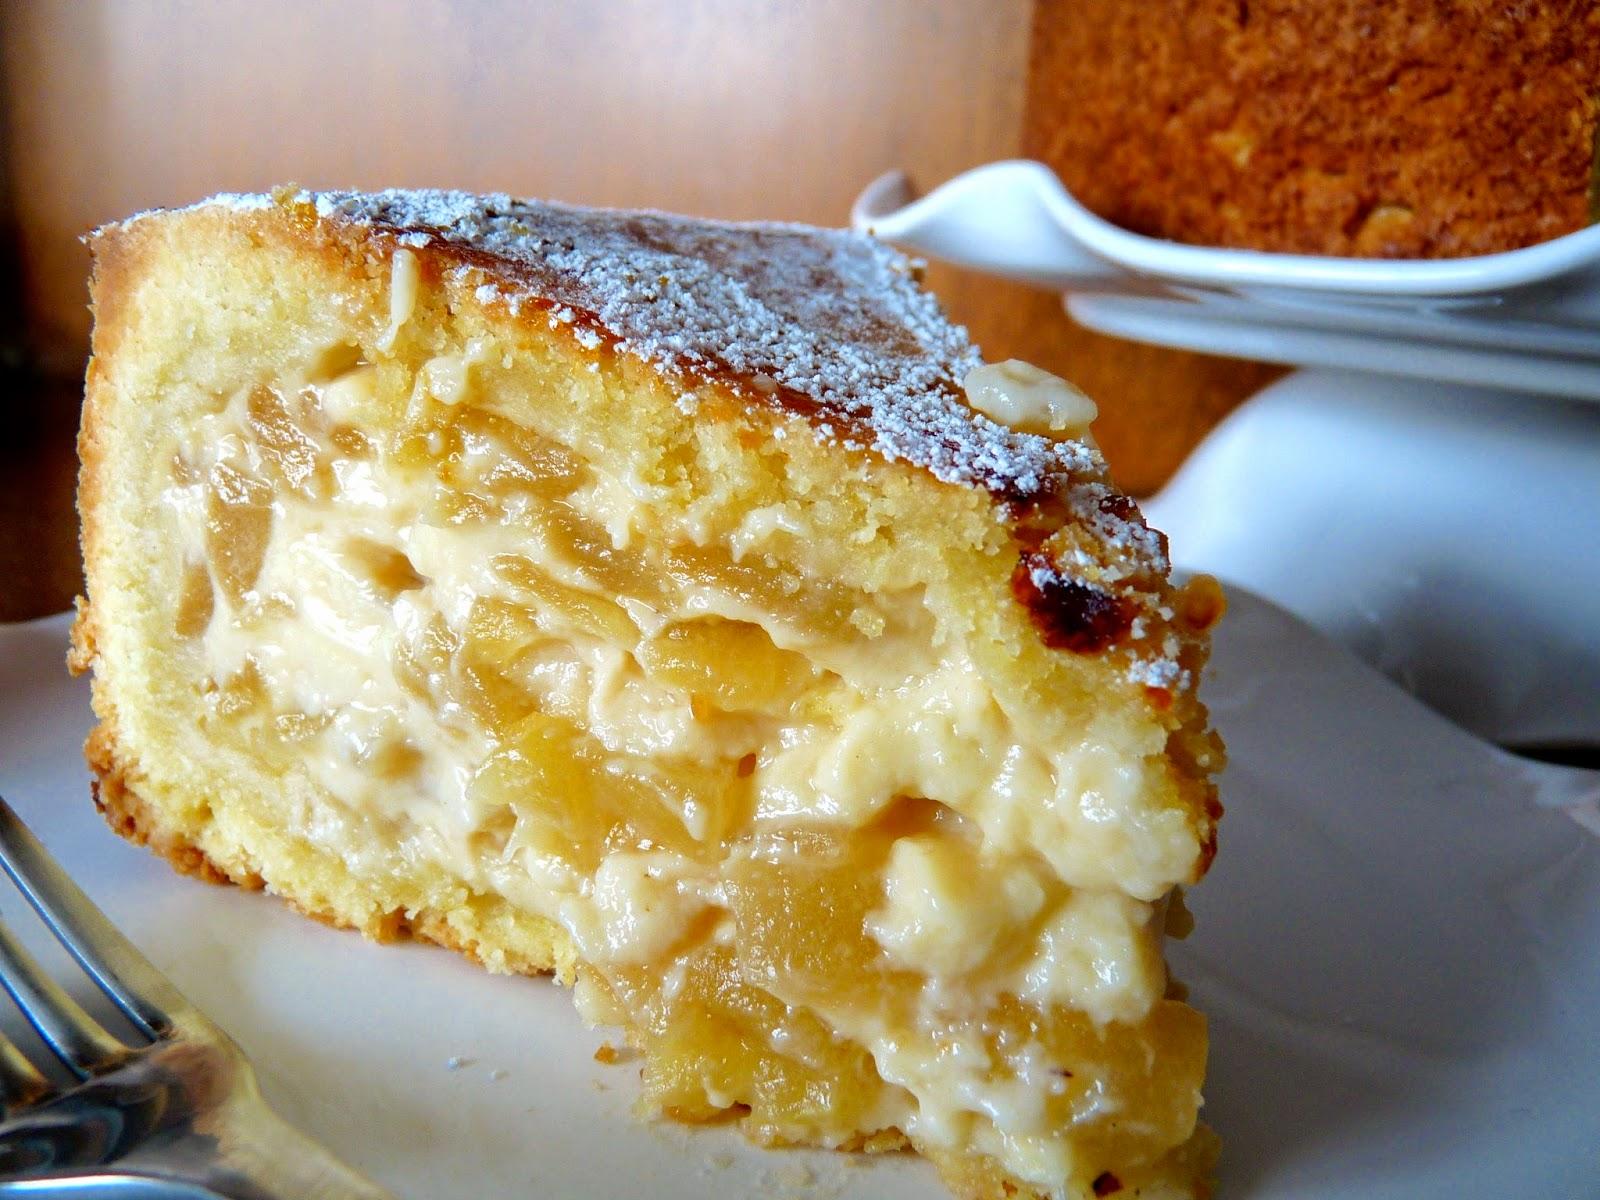 La cocina de piescu tarta de manzana asturiana for Cocina asturiana